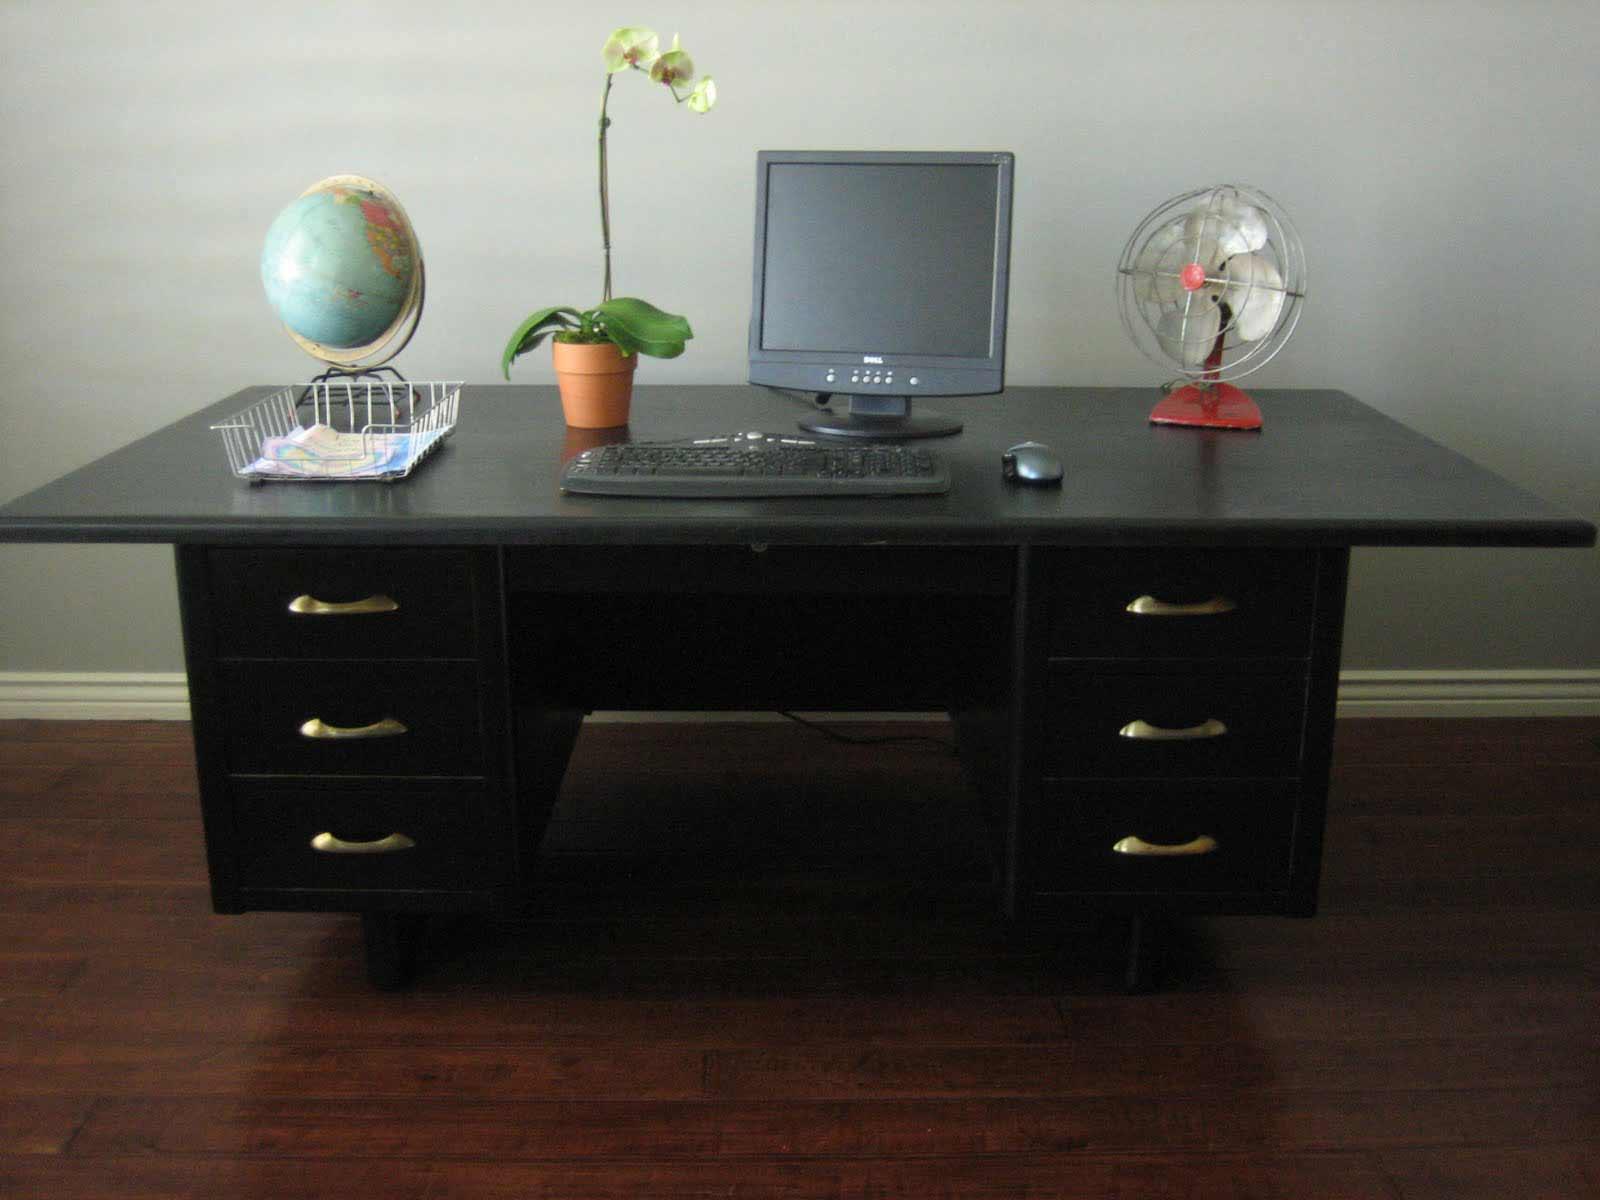 Black-Cool-Office-Desks-in-Wide-Size 9 Black Office Desk Designs & How to Choose the Best one